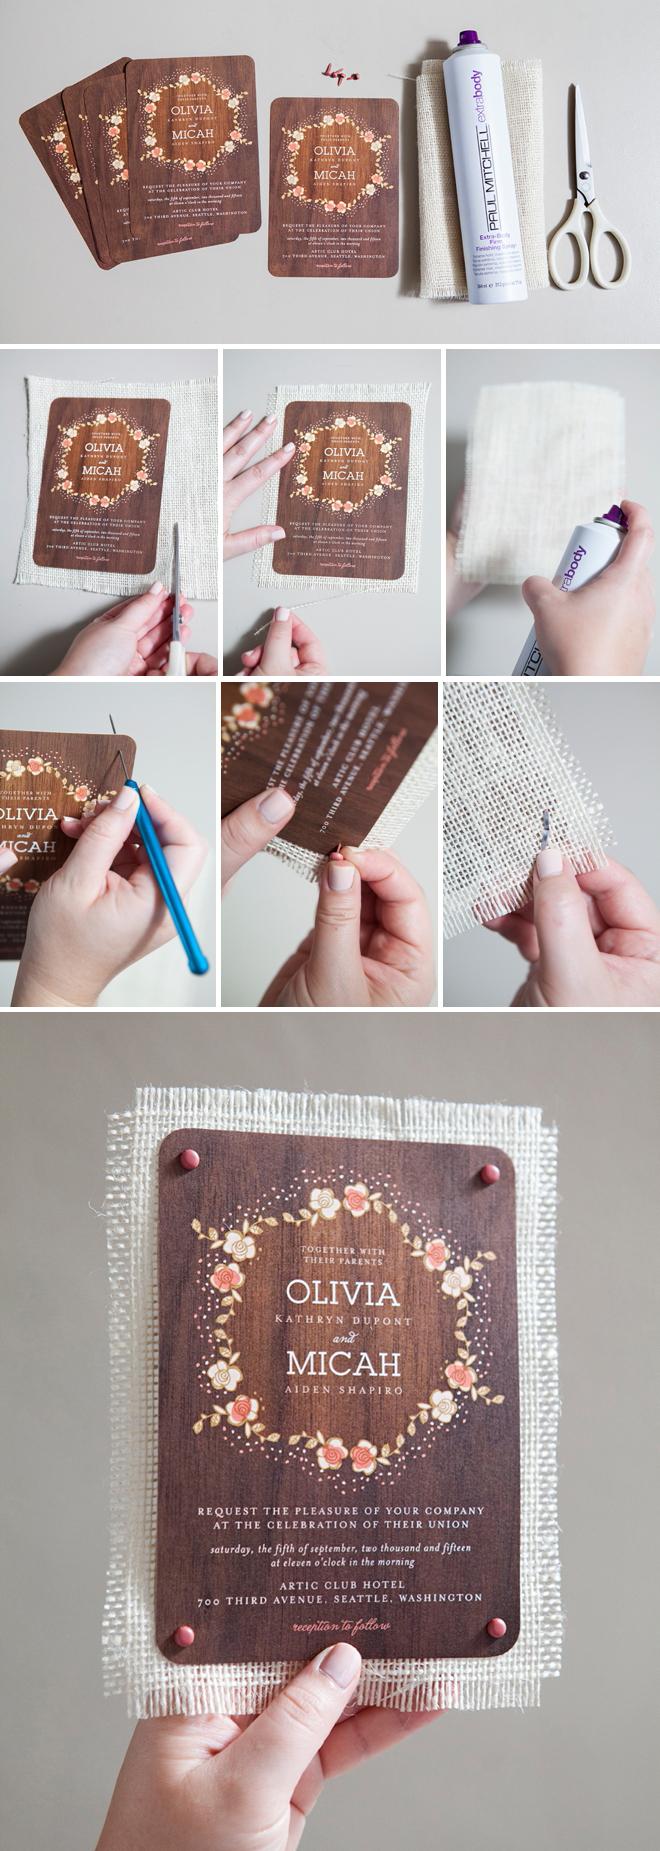 DIY - How to mount your wedding invitation on burlap